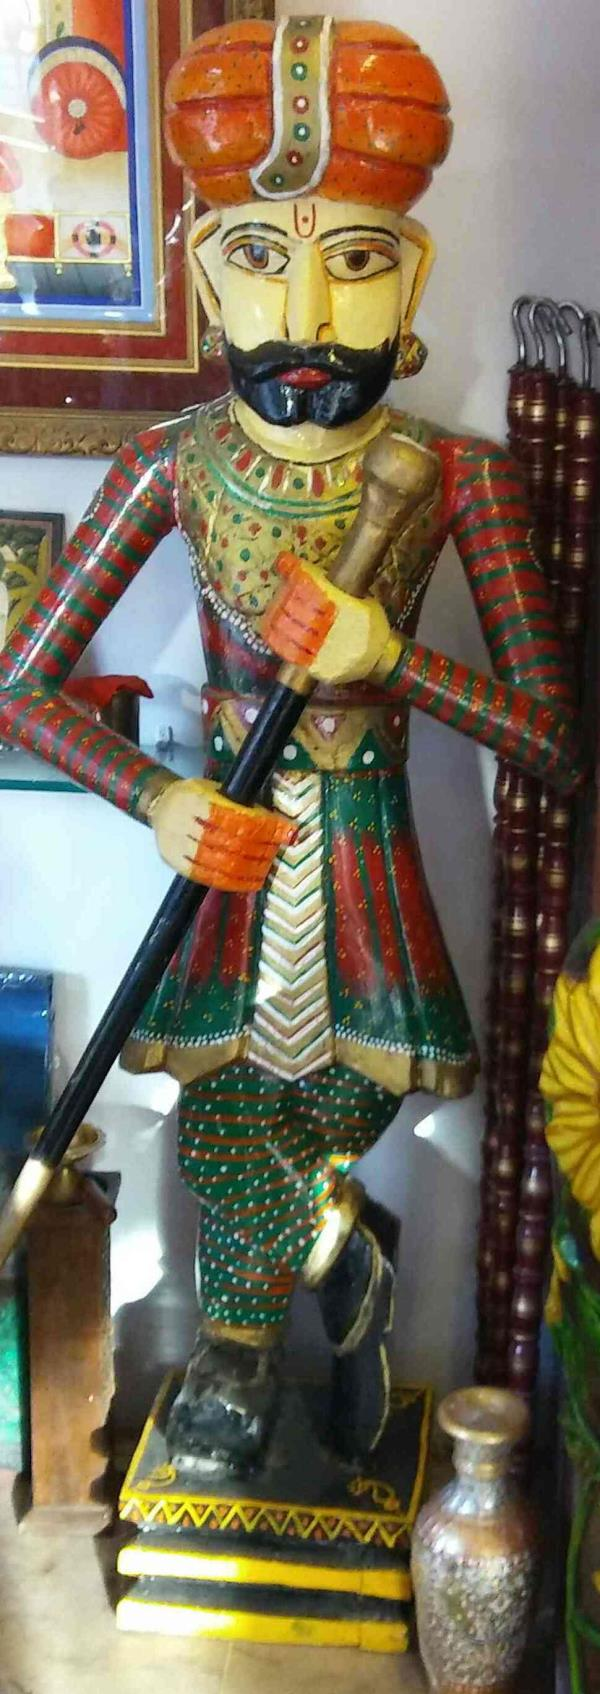 Handi craft products in alkapuri , vadodara, gujarat. - by Kala Gurjari, Vadodara